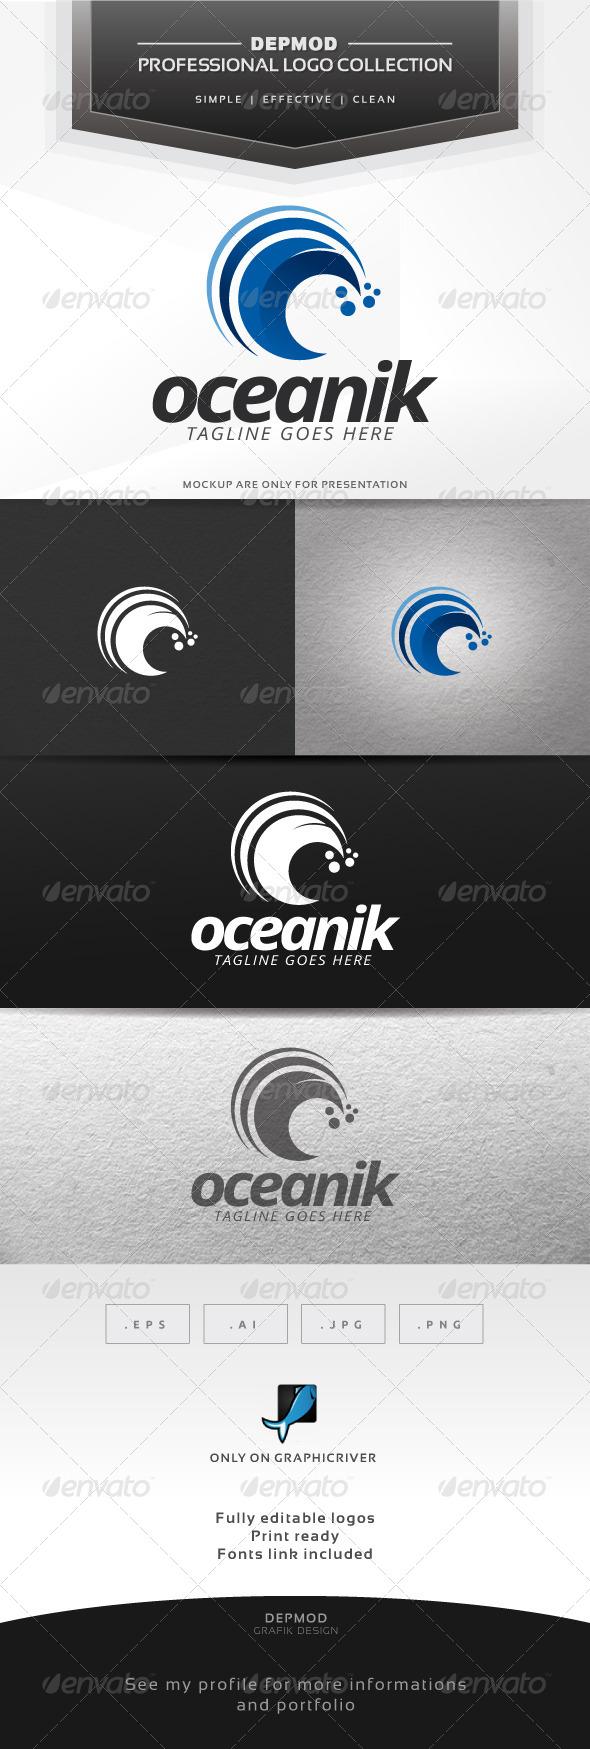 Oceanik Logo - Nature Logo Templates